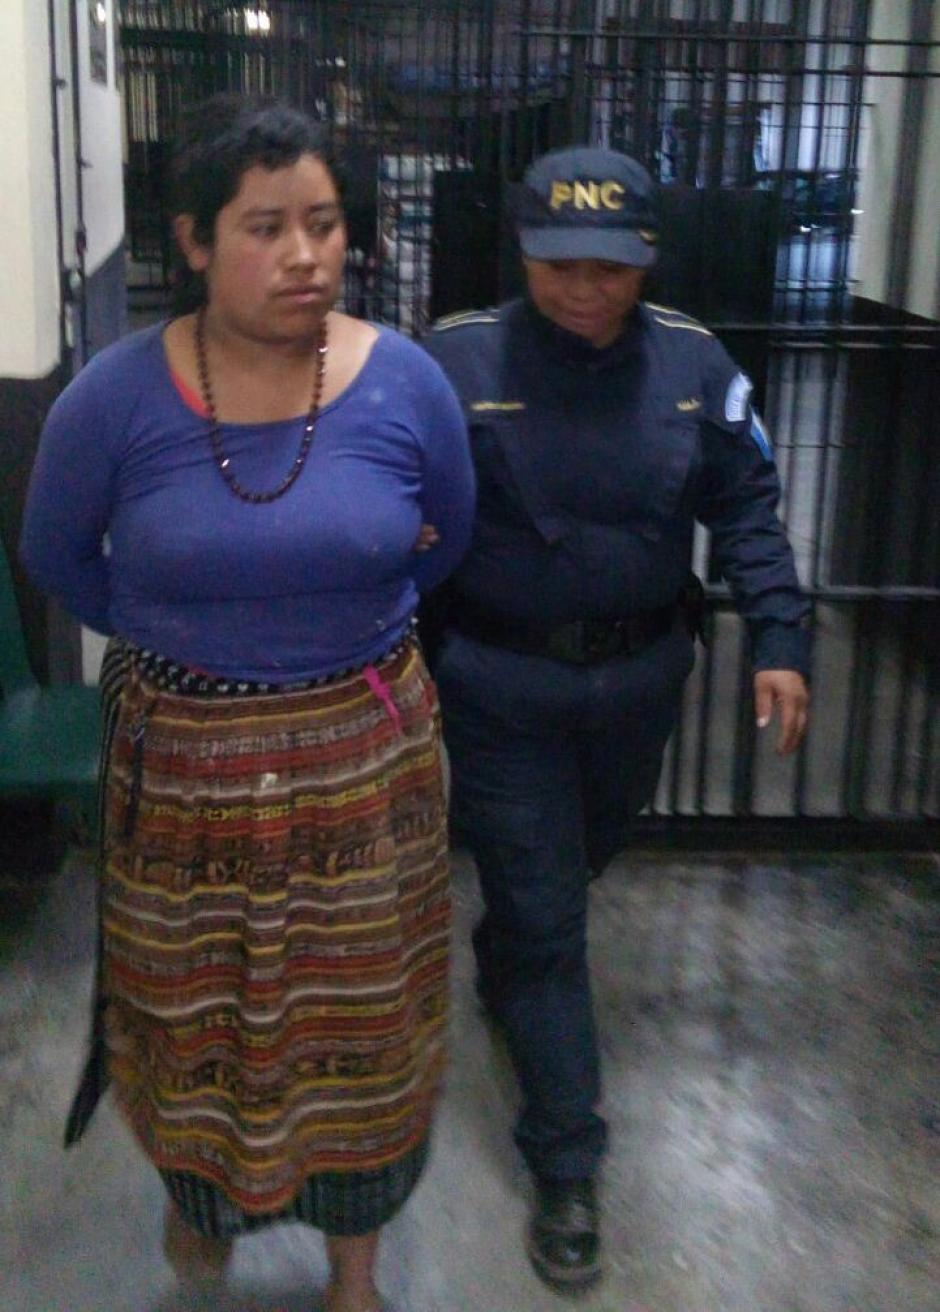 Amalia Argentina Ruiz Colop de Bautista pretendía vender a una bebé. (Foto: PNC)